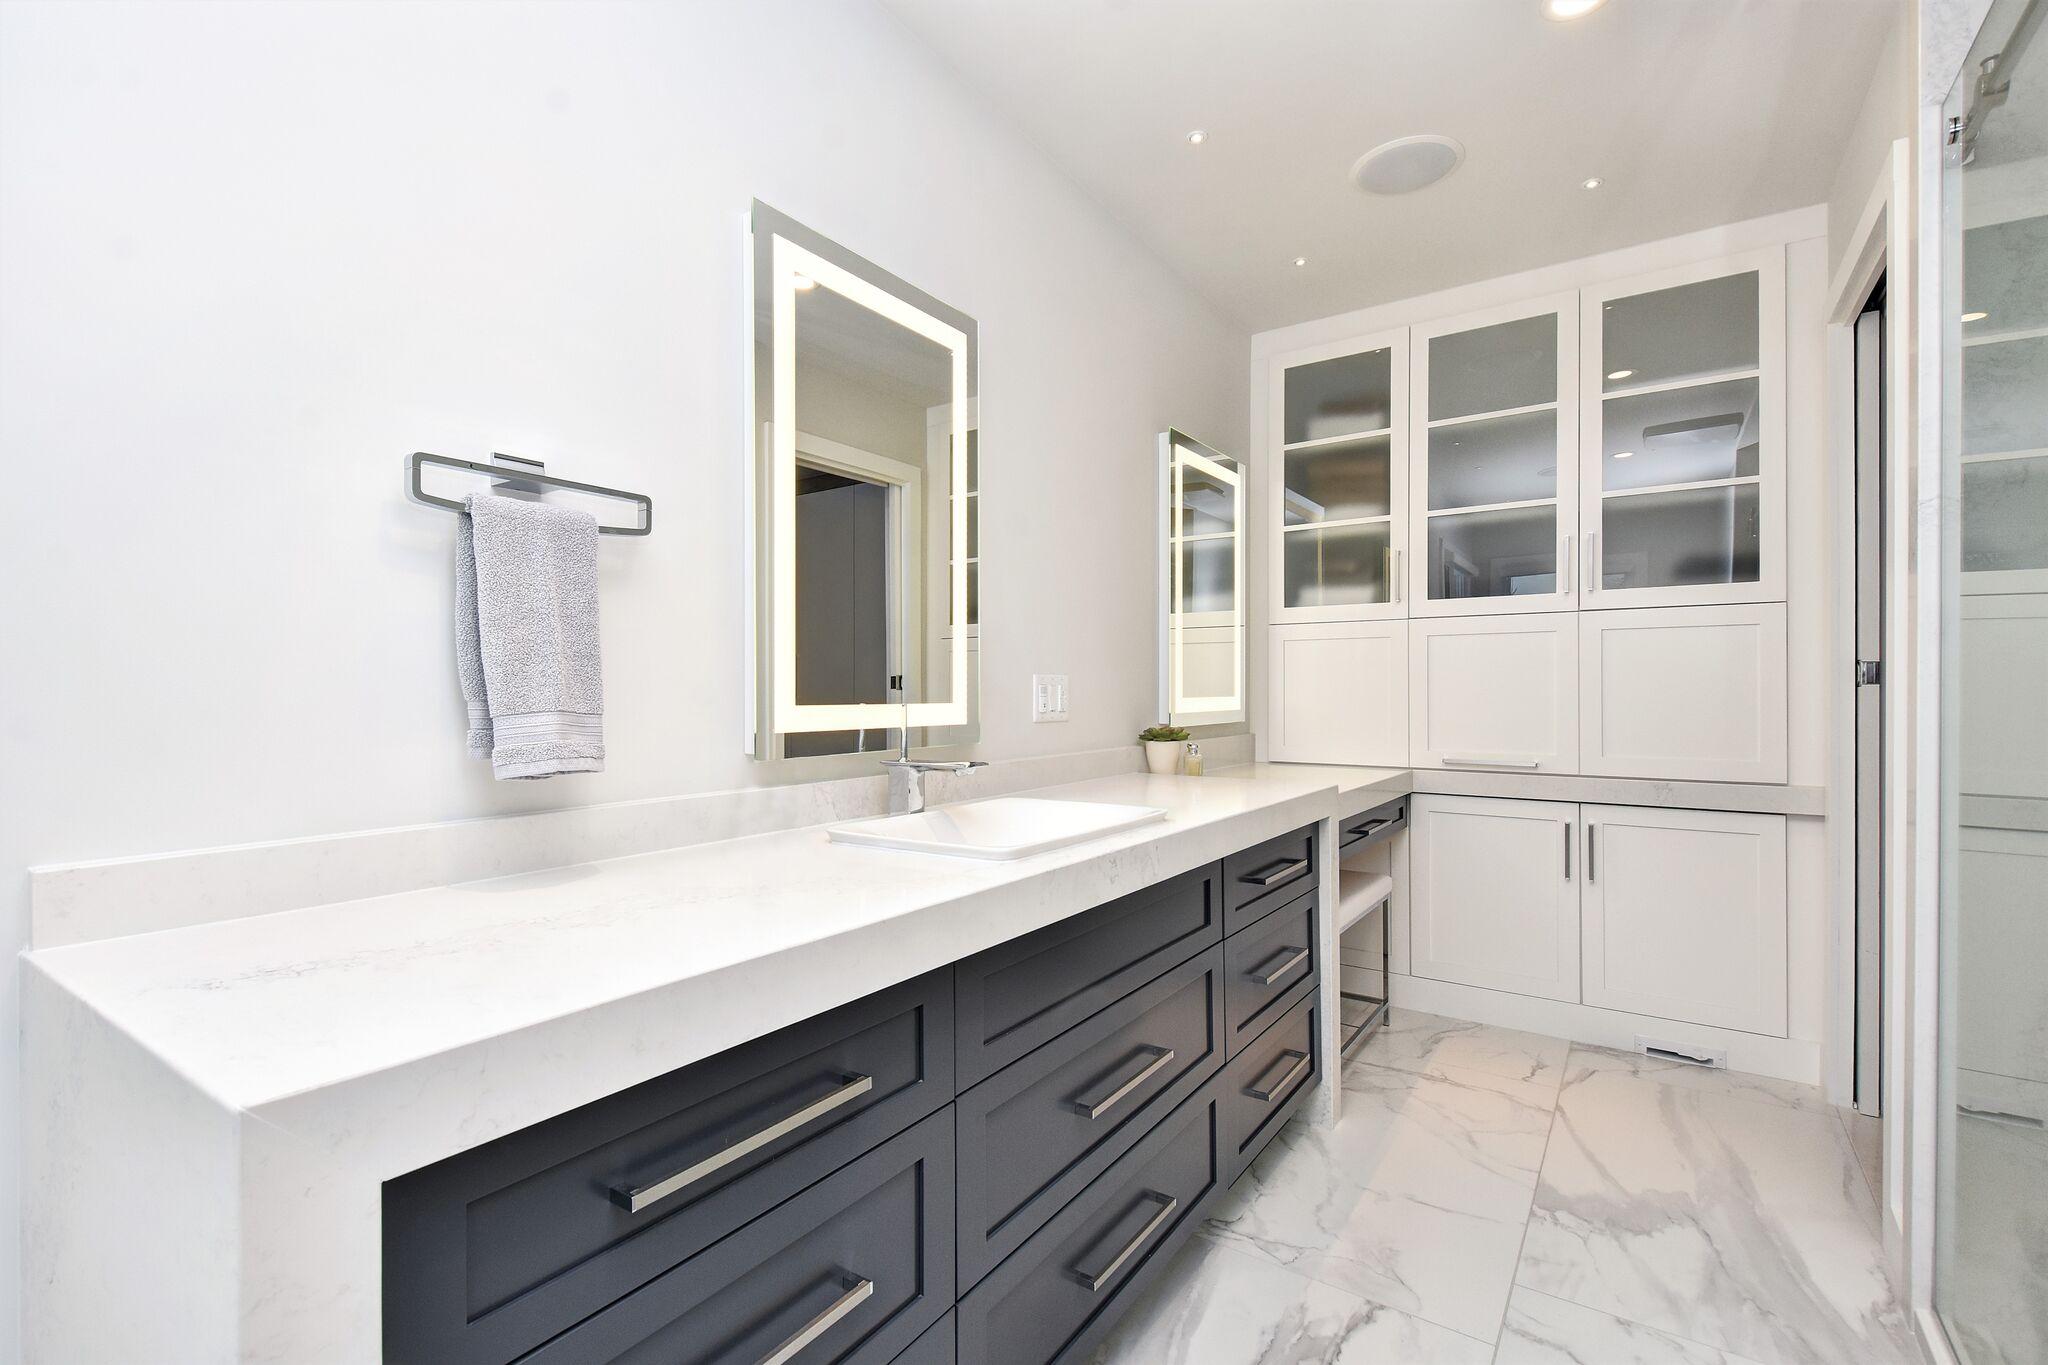 Contemporary modern bathroom, dark vanity with white top, make-up vanity